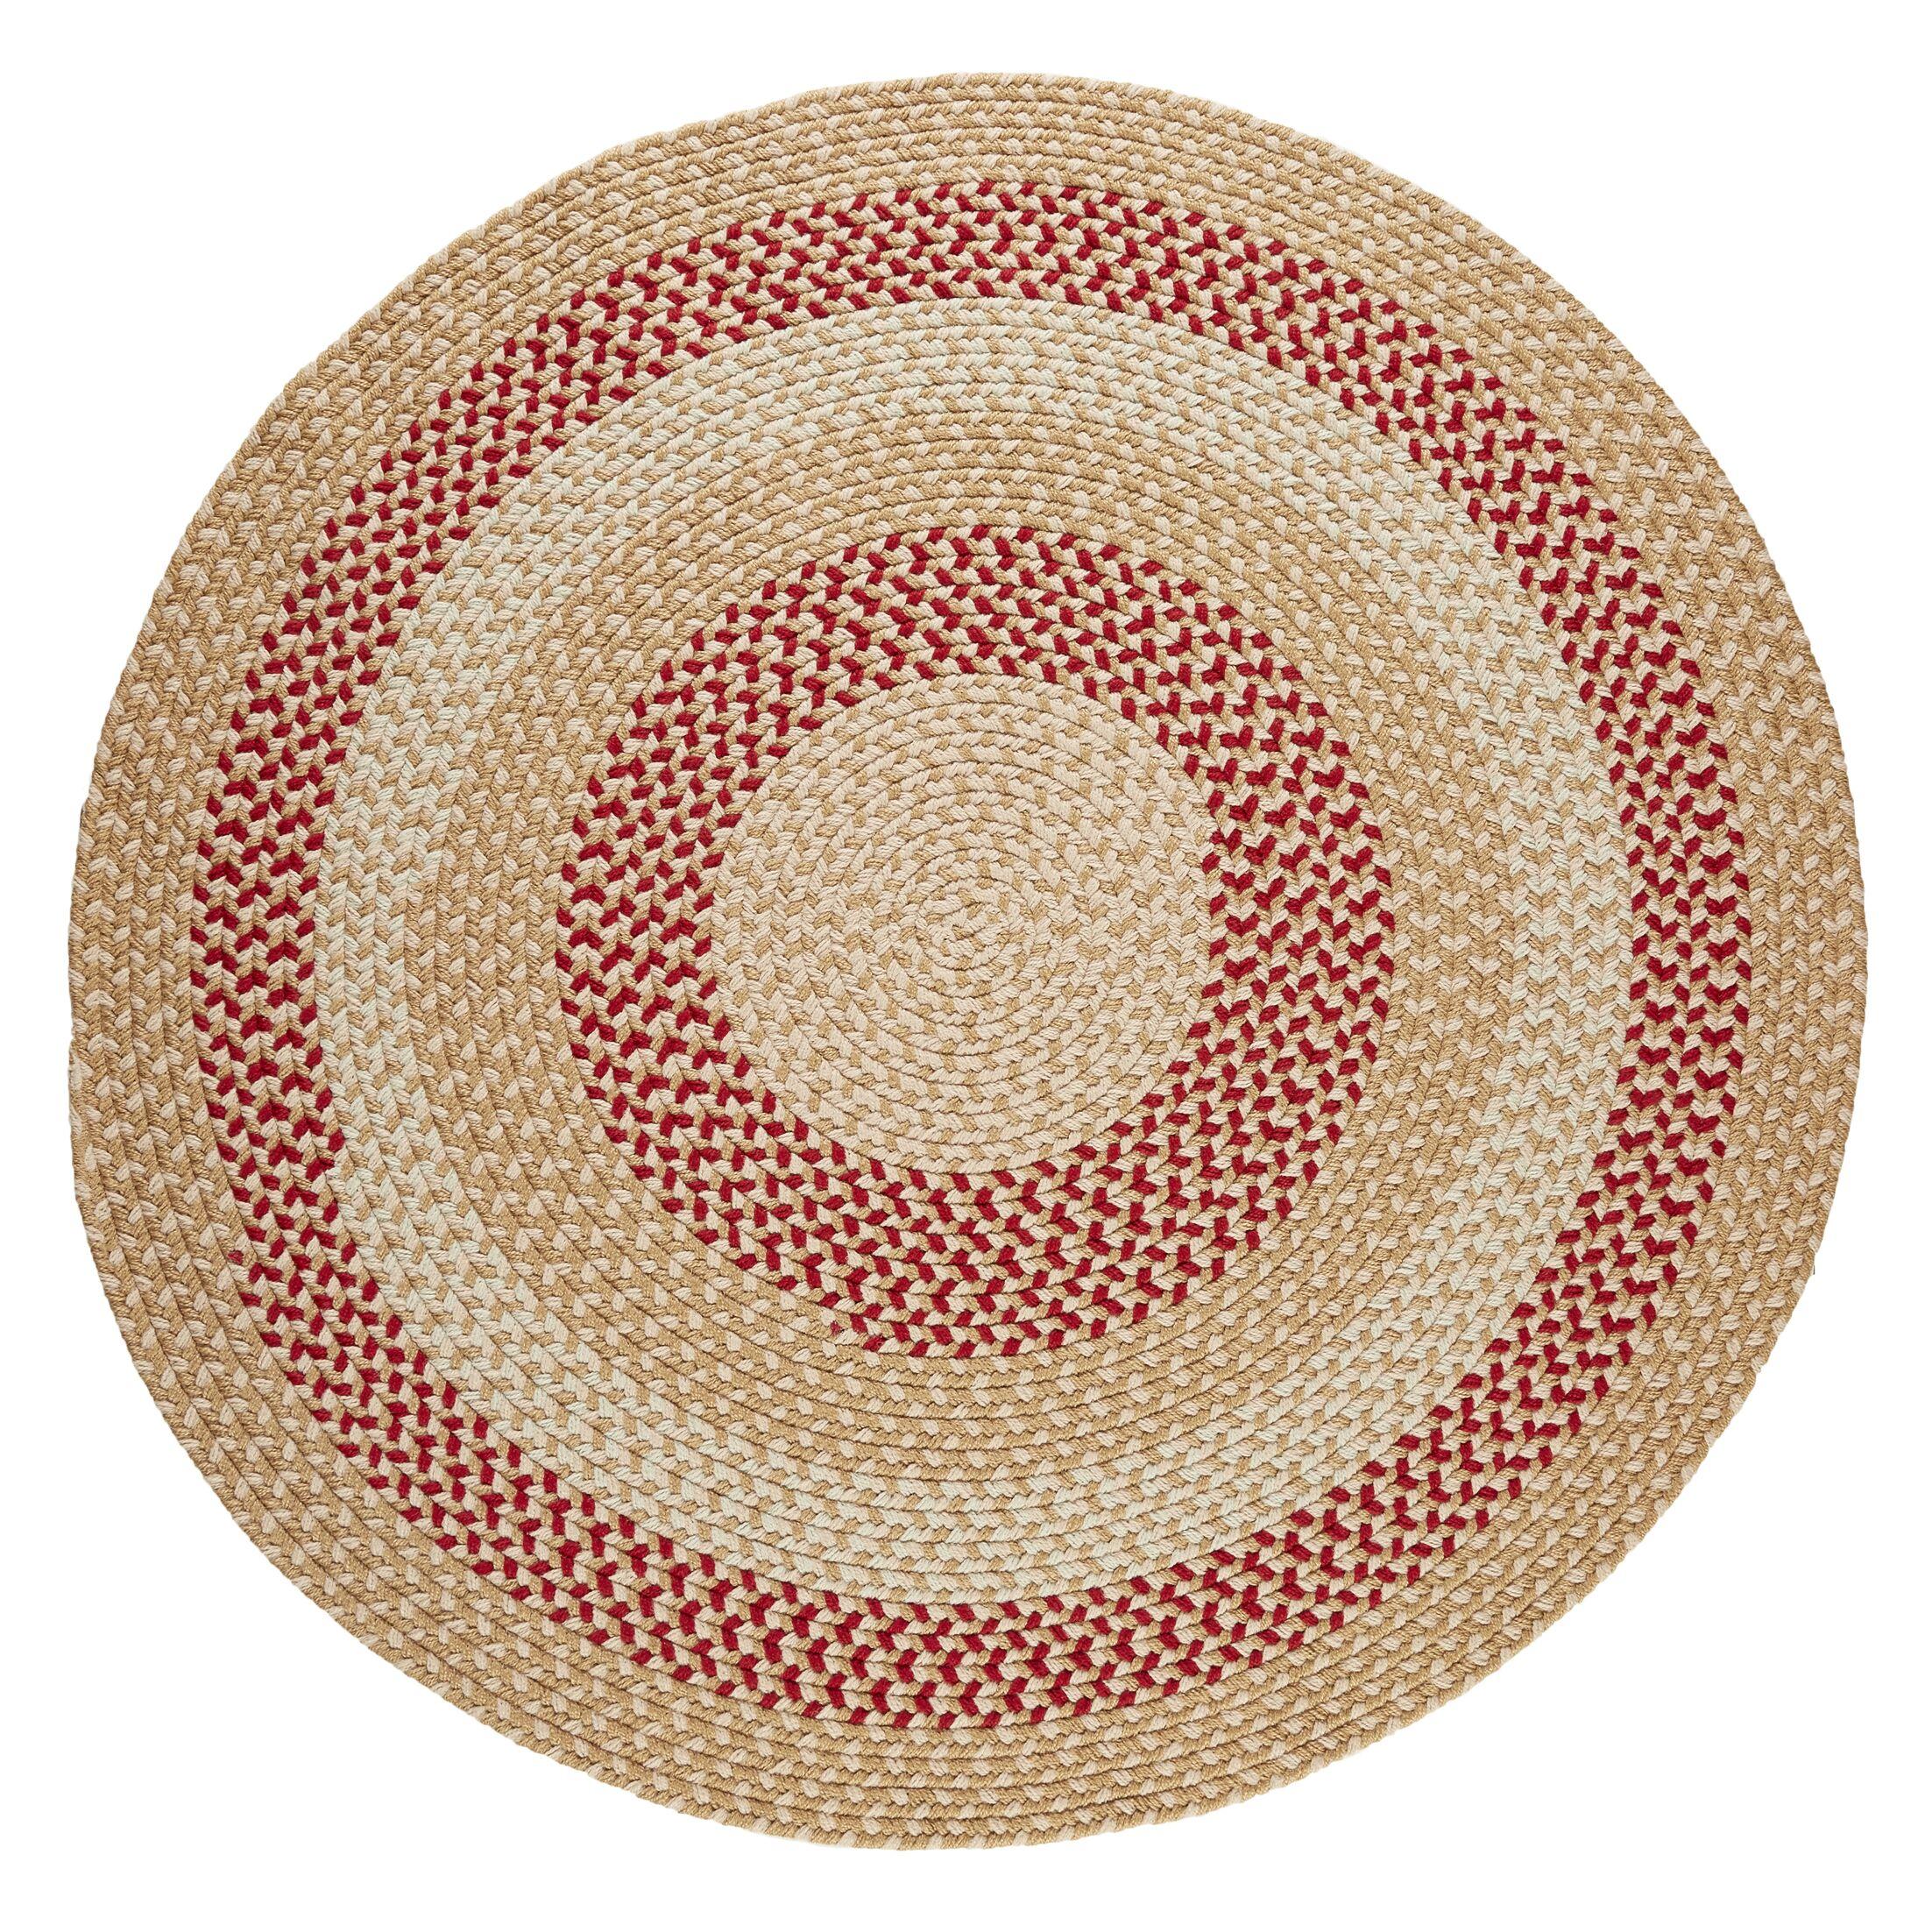 Handmade Natural Indoor/Outdoor Rug Rug Size: Round 4'